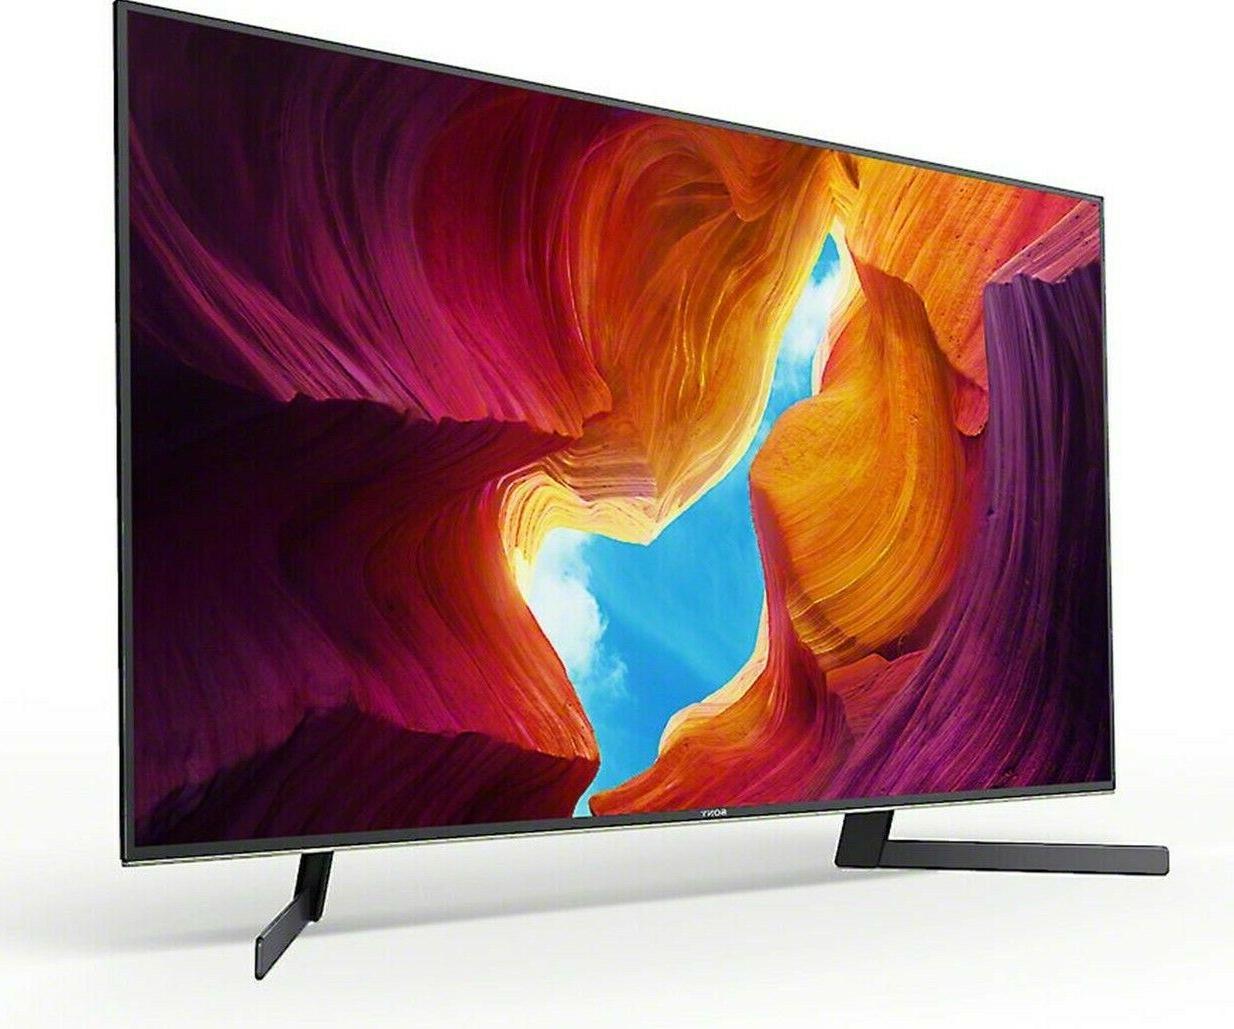 Sony HDR 4K Smart TV